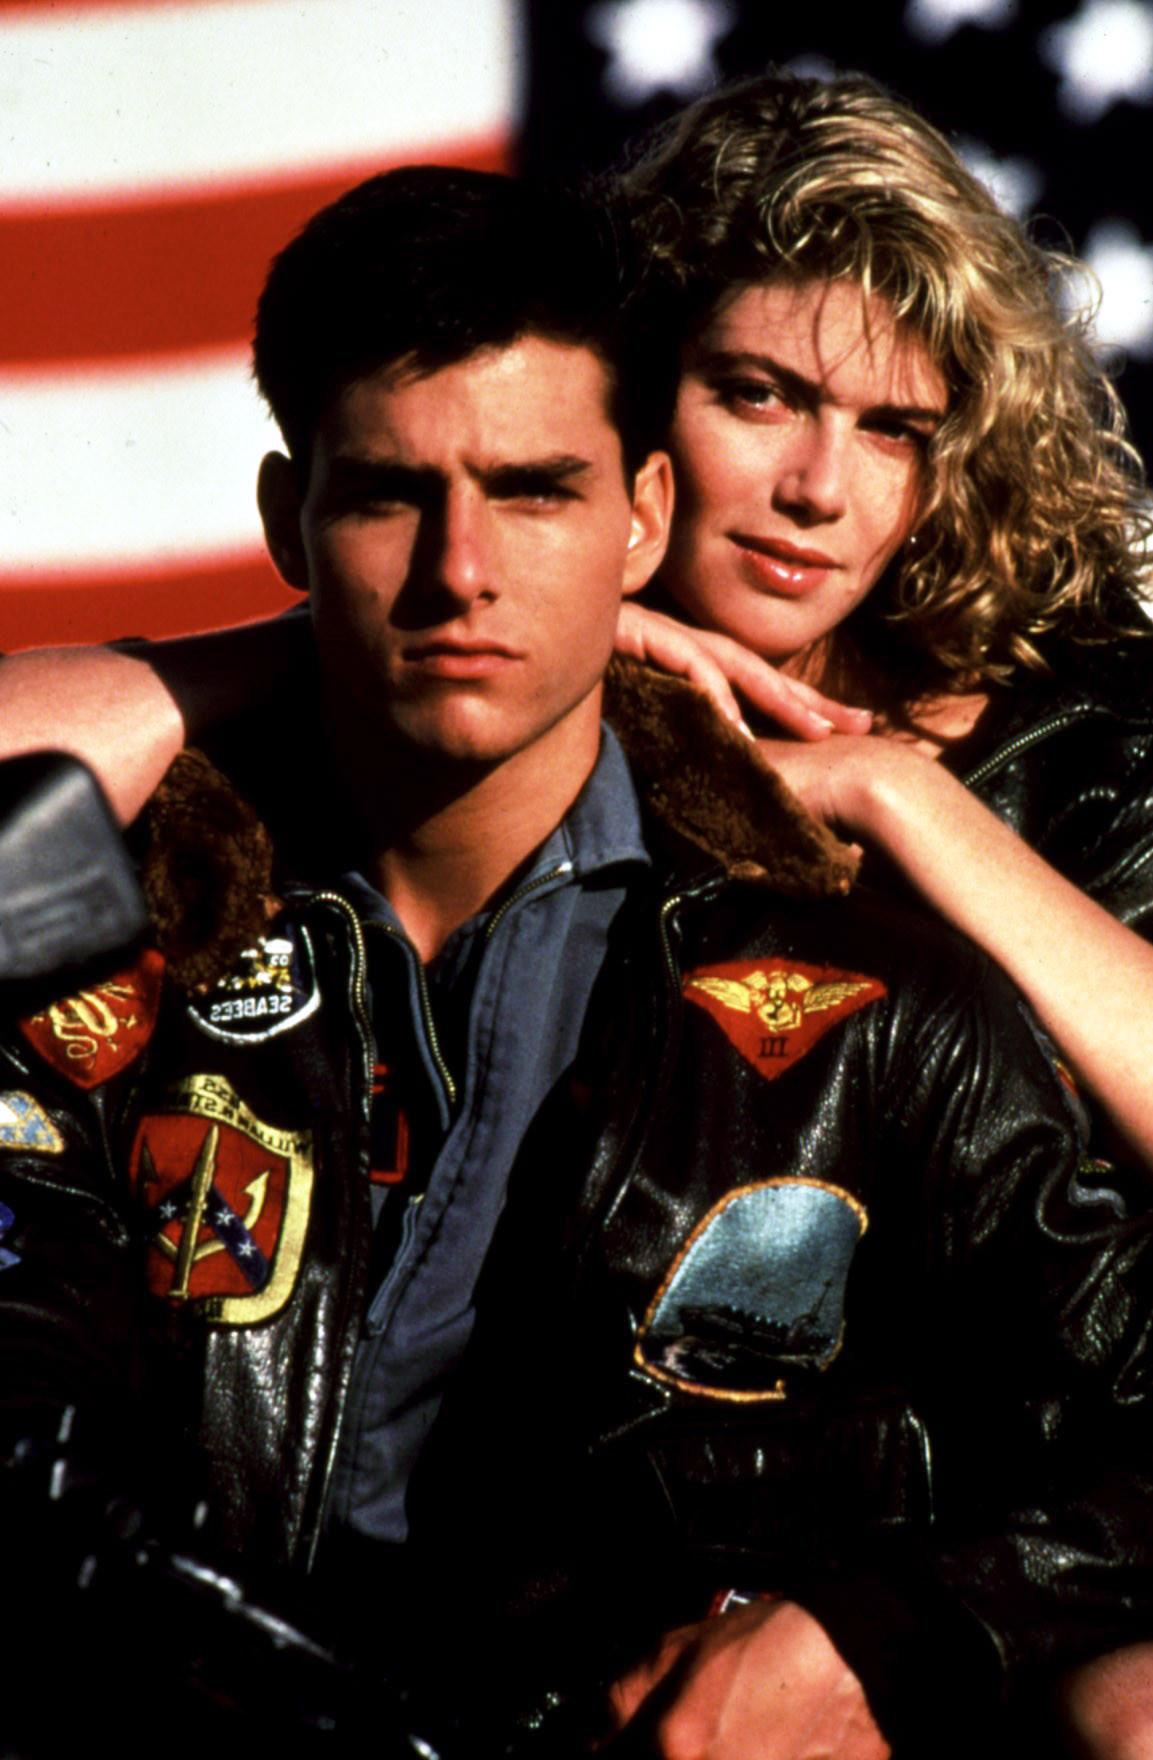 Bikers Quotes Hd Wallpapers Ttbbm Top Gun 1986 Mondaymemories